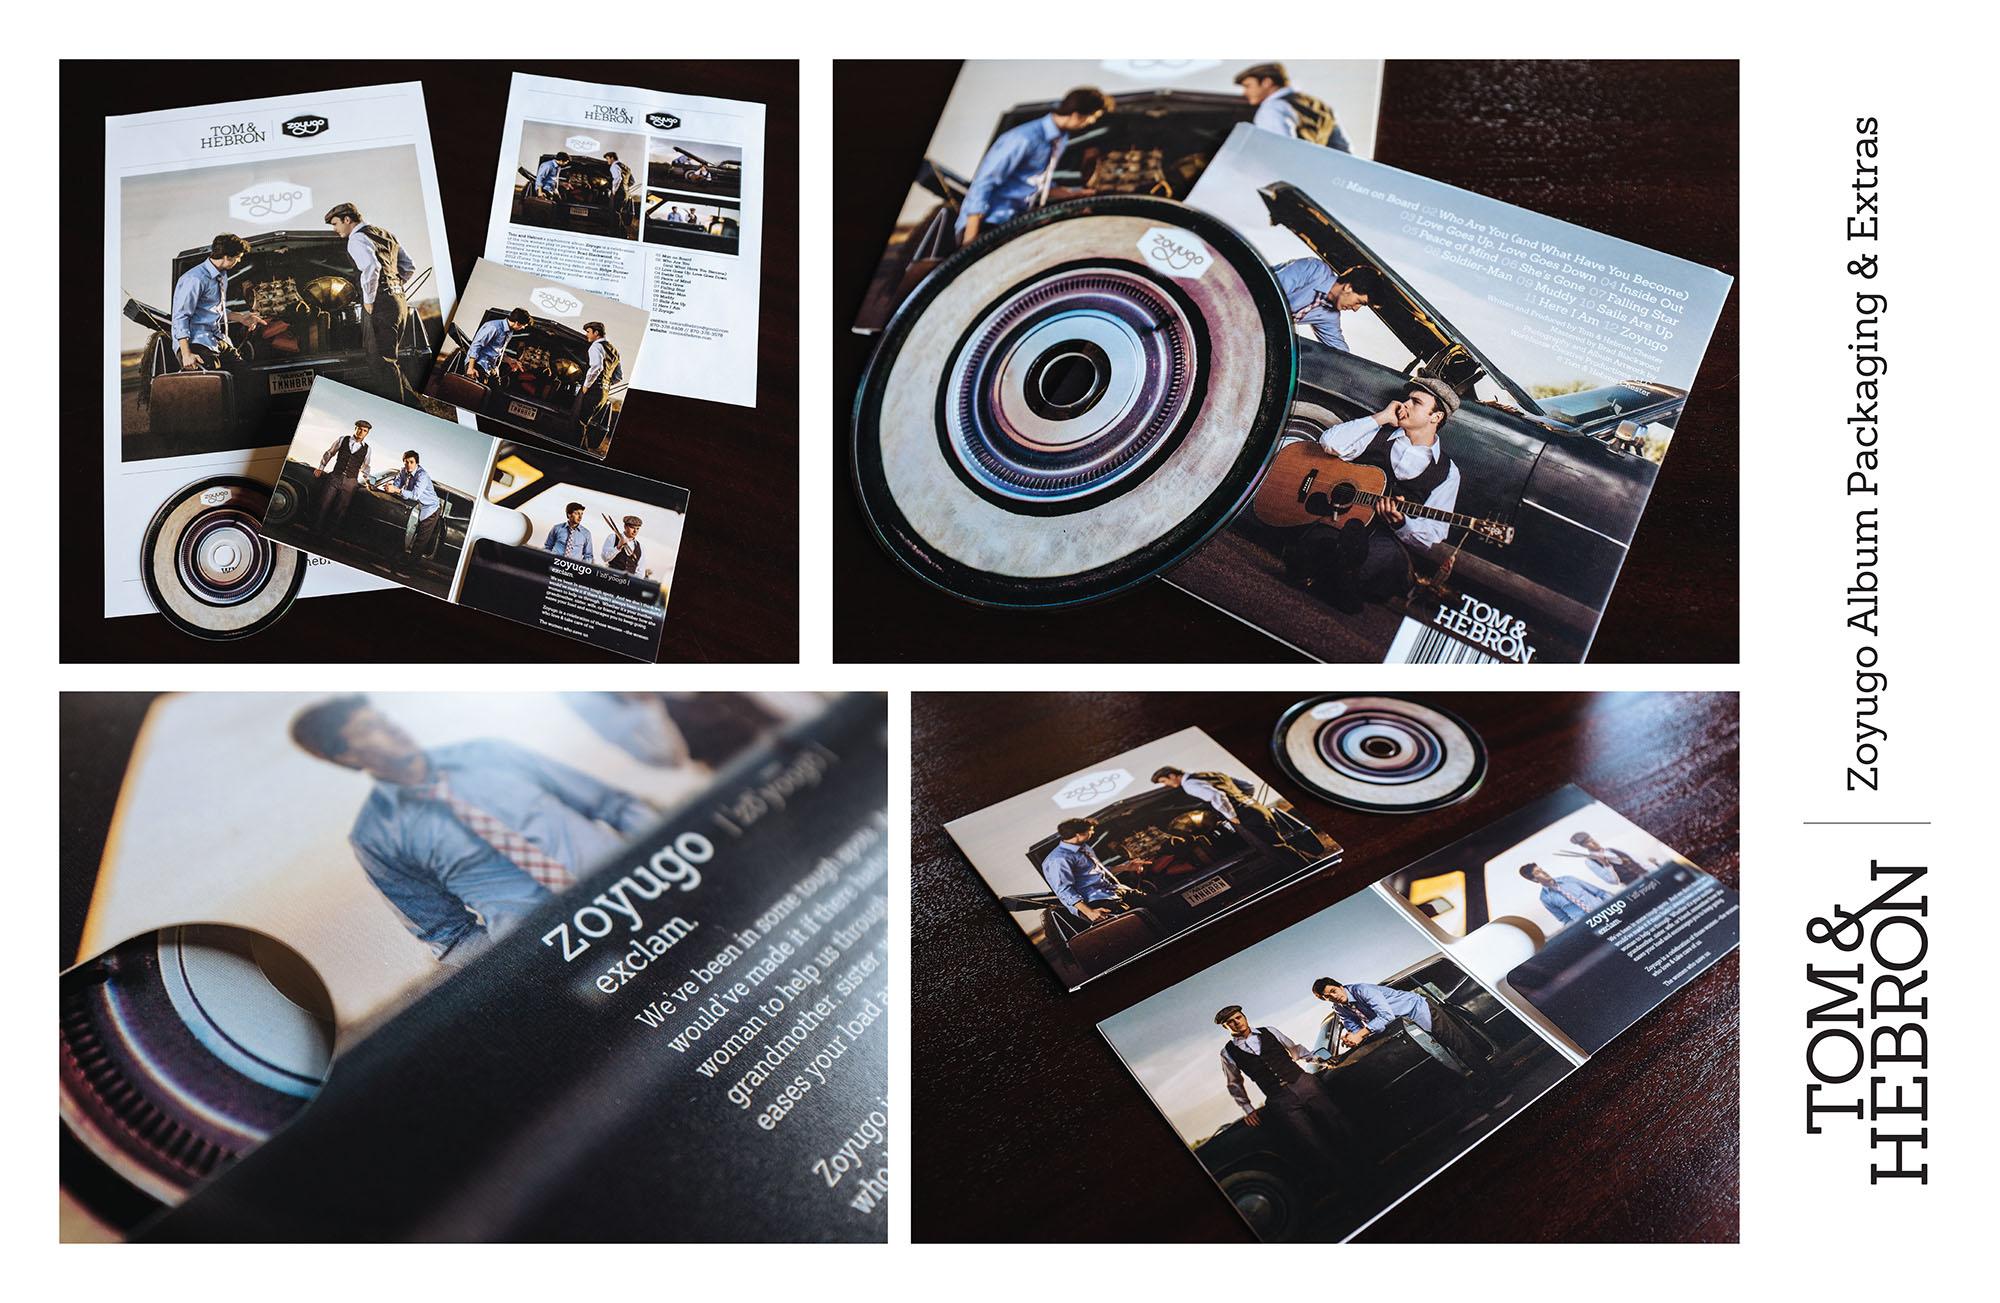 ZOYUGO_packaging photos.jpg